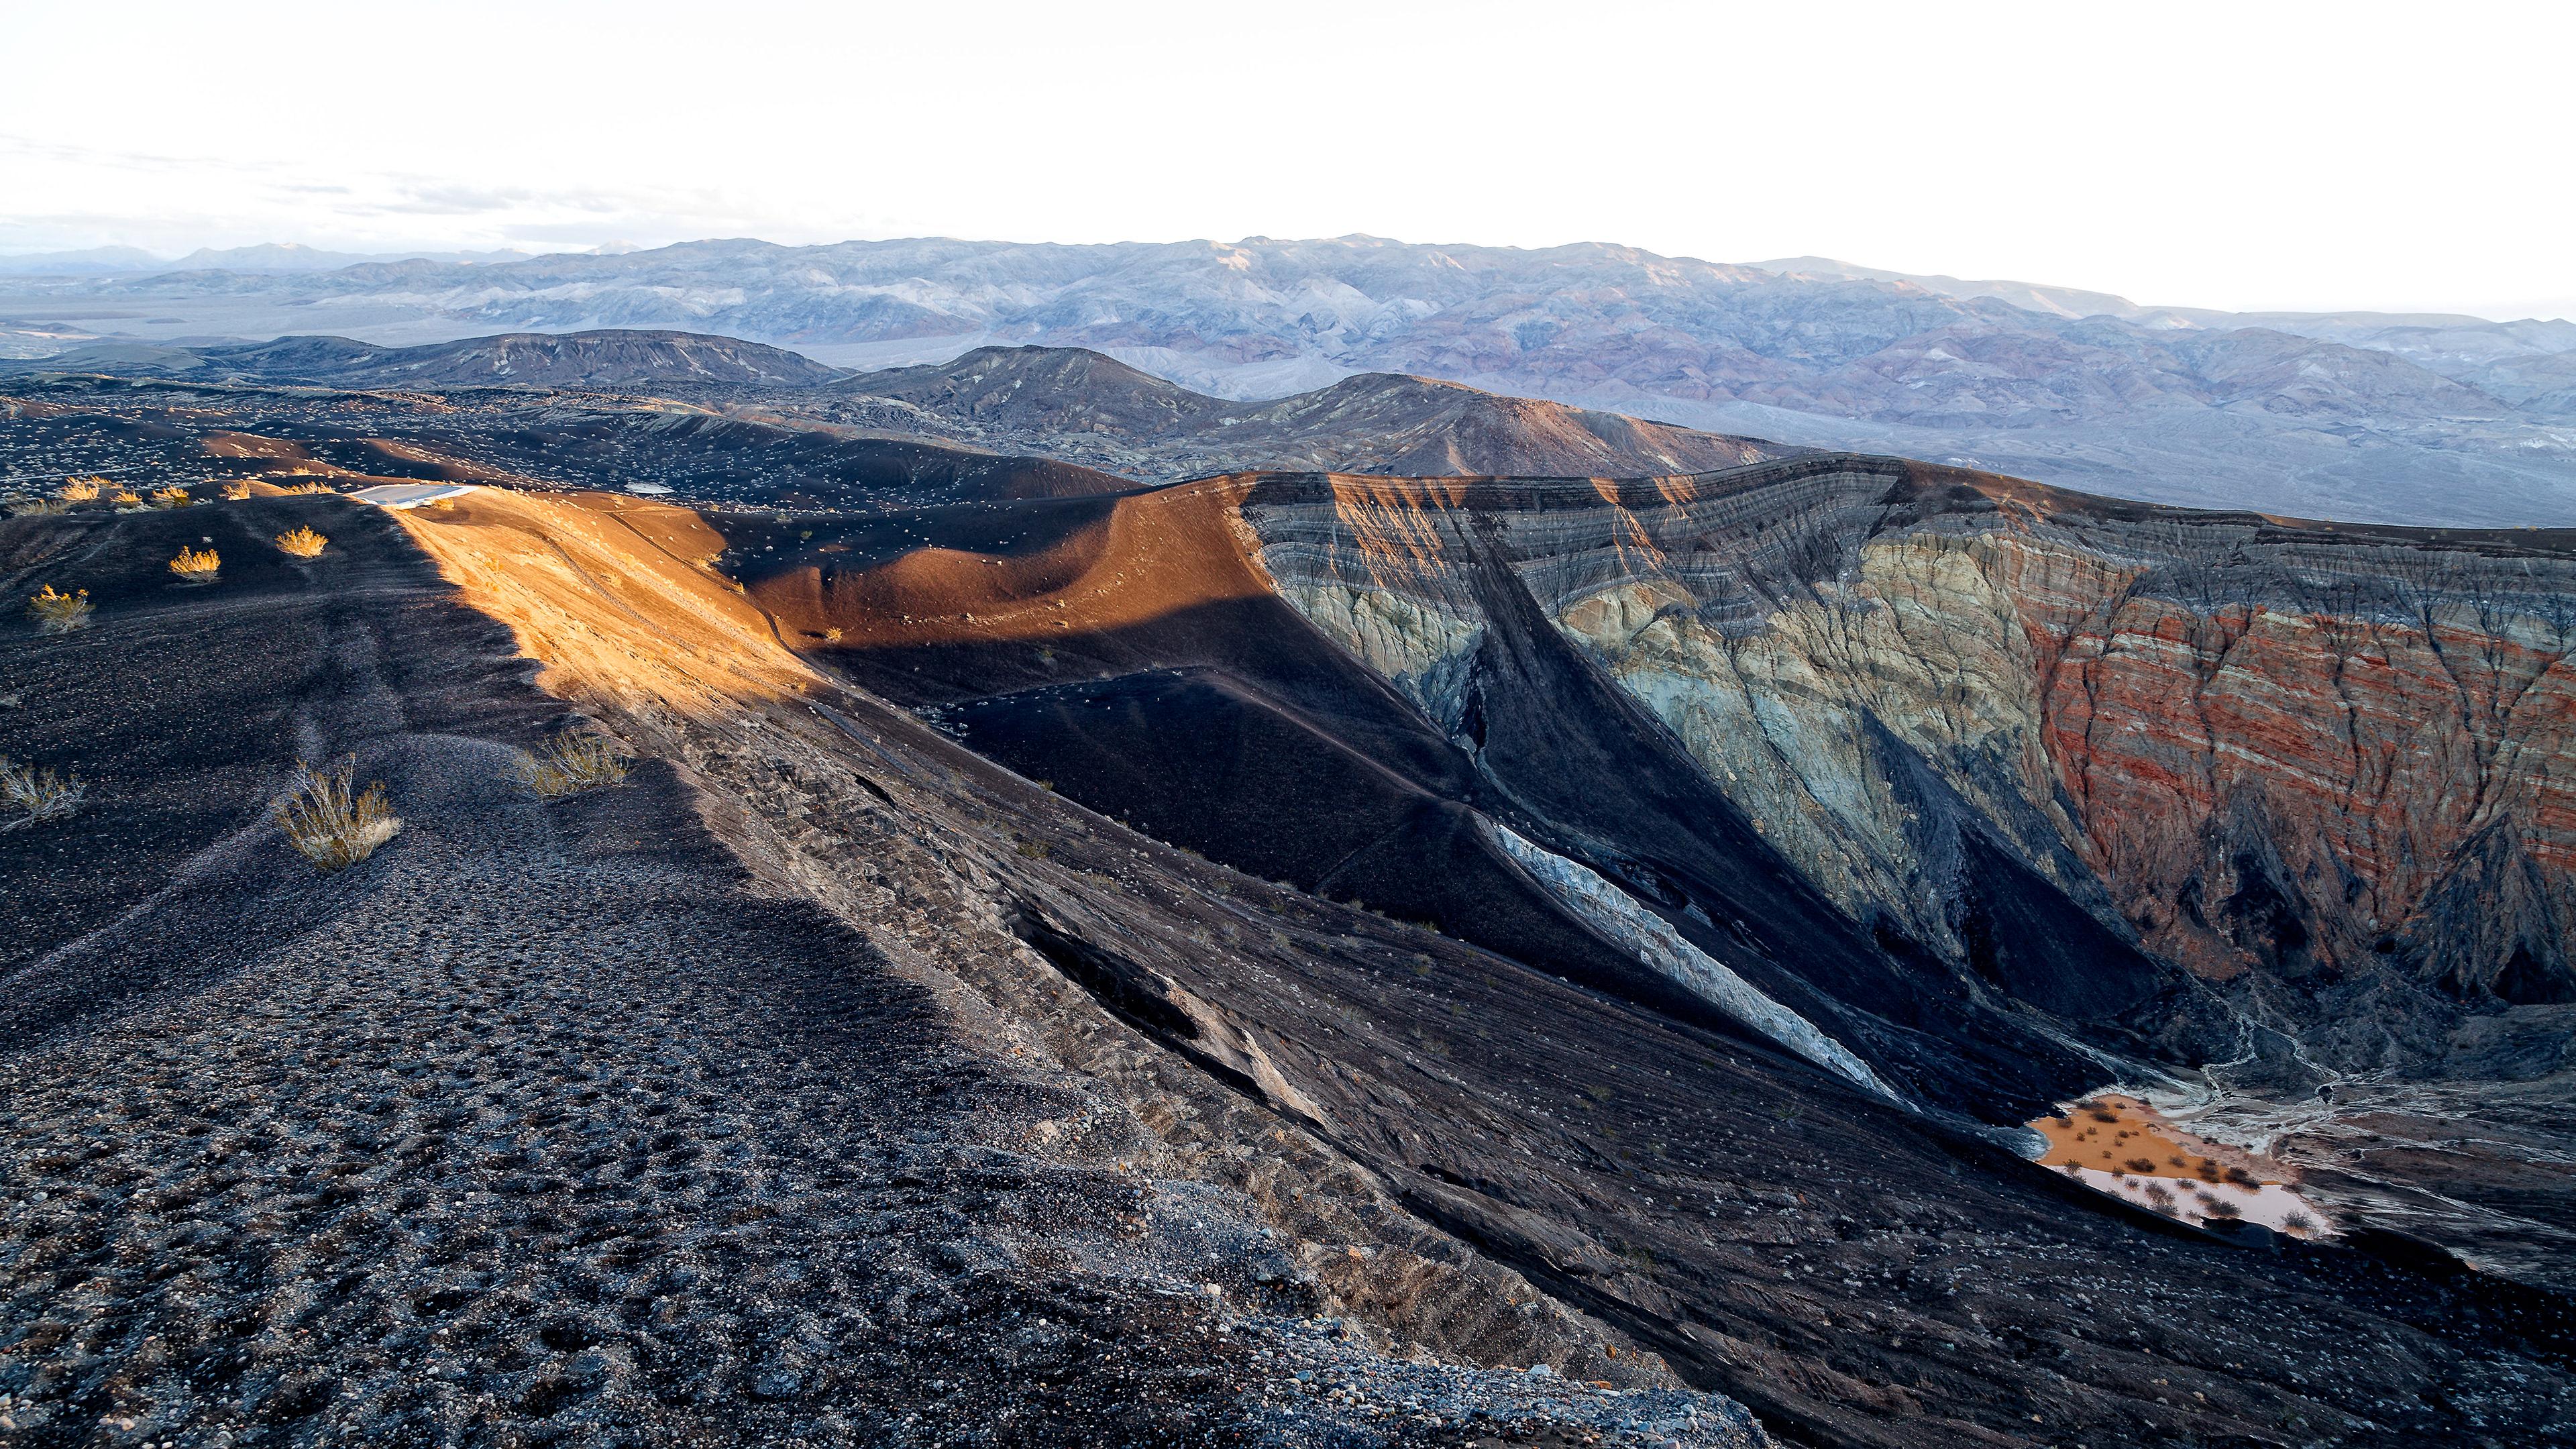 Patrick Appel - Death Valley National Park 2017